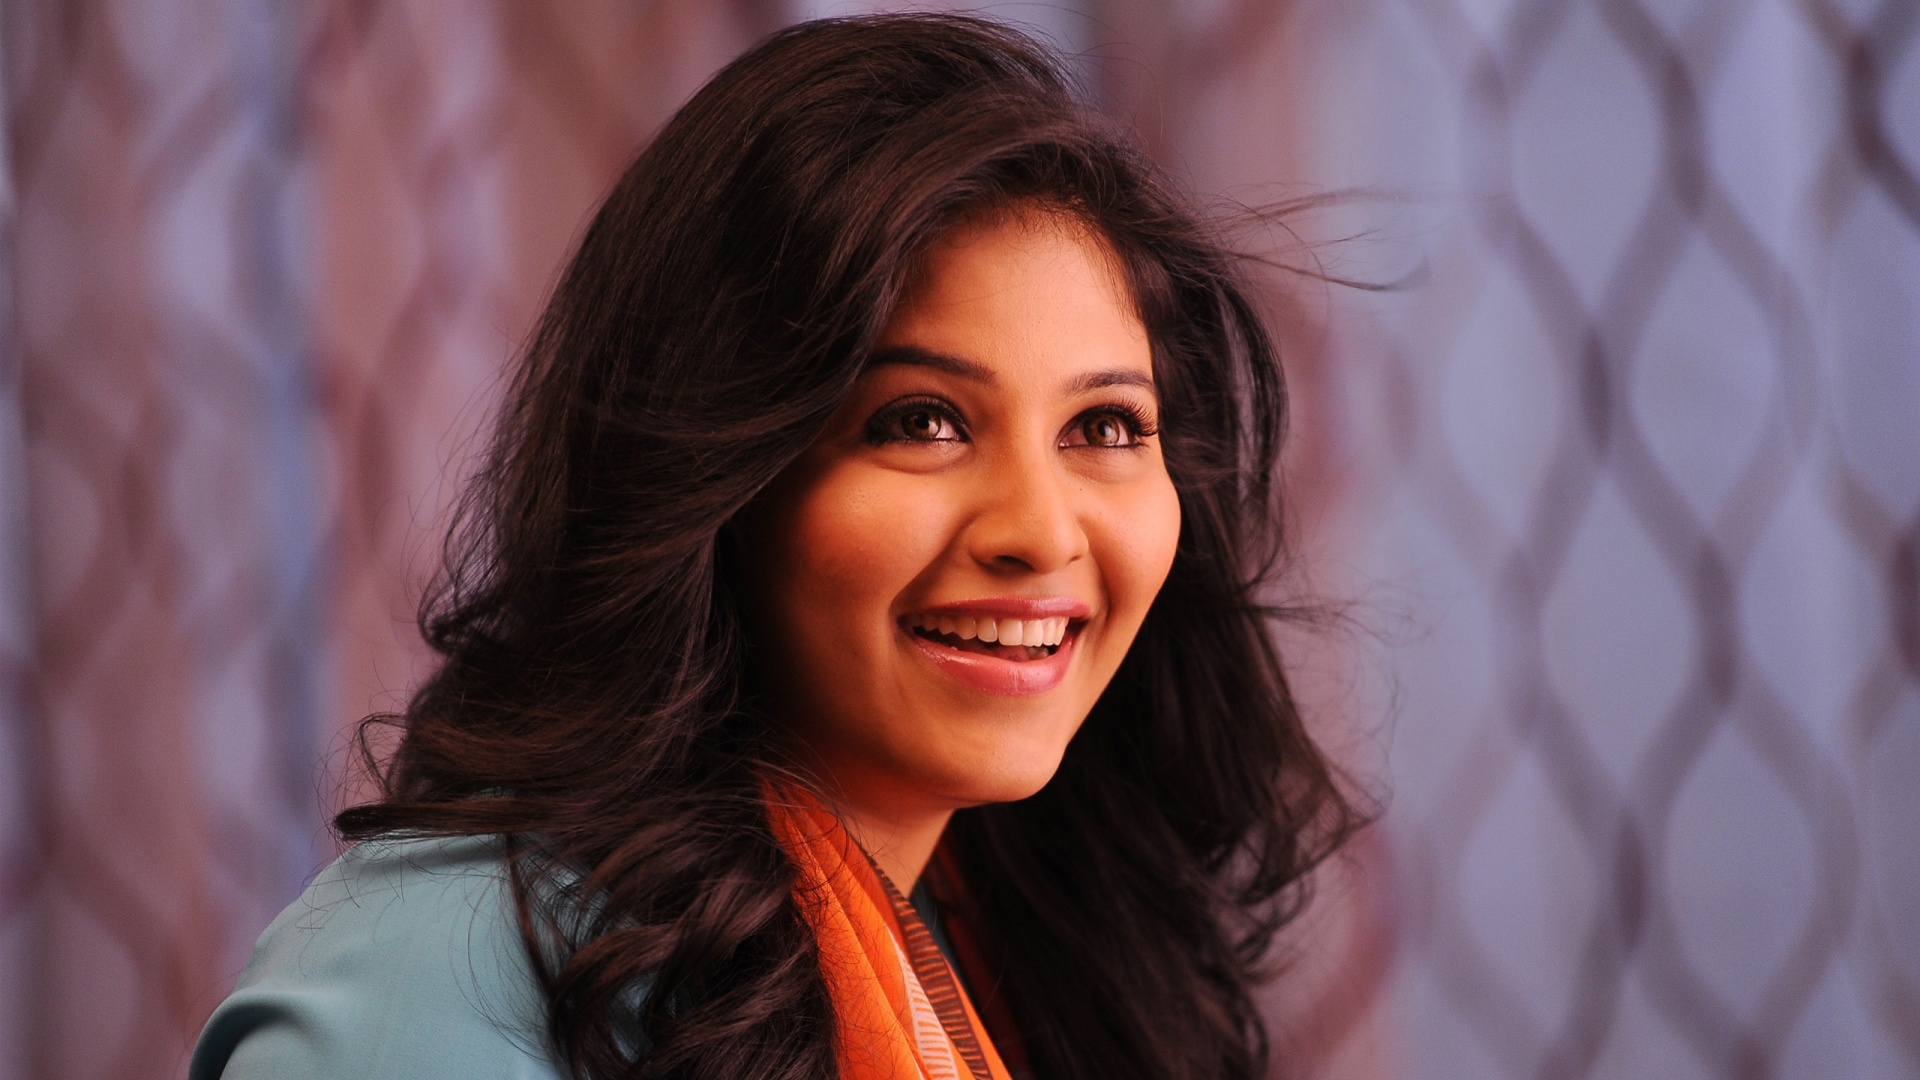 Anjali Telugu Heroine Wallpapers In Jpg Format For Free Download